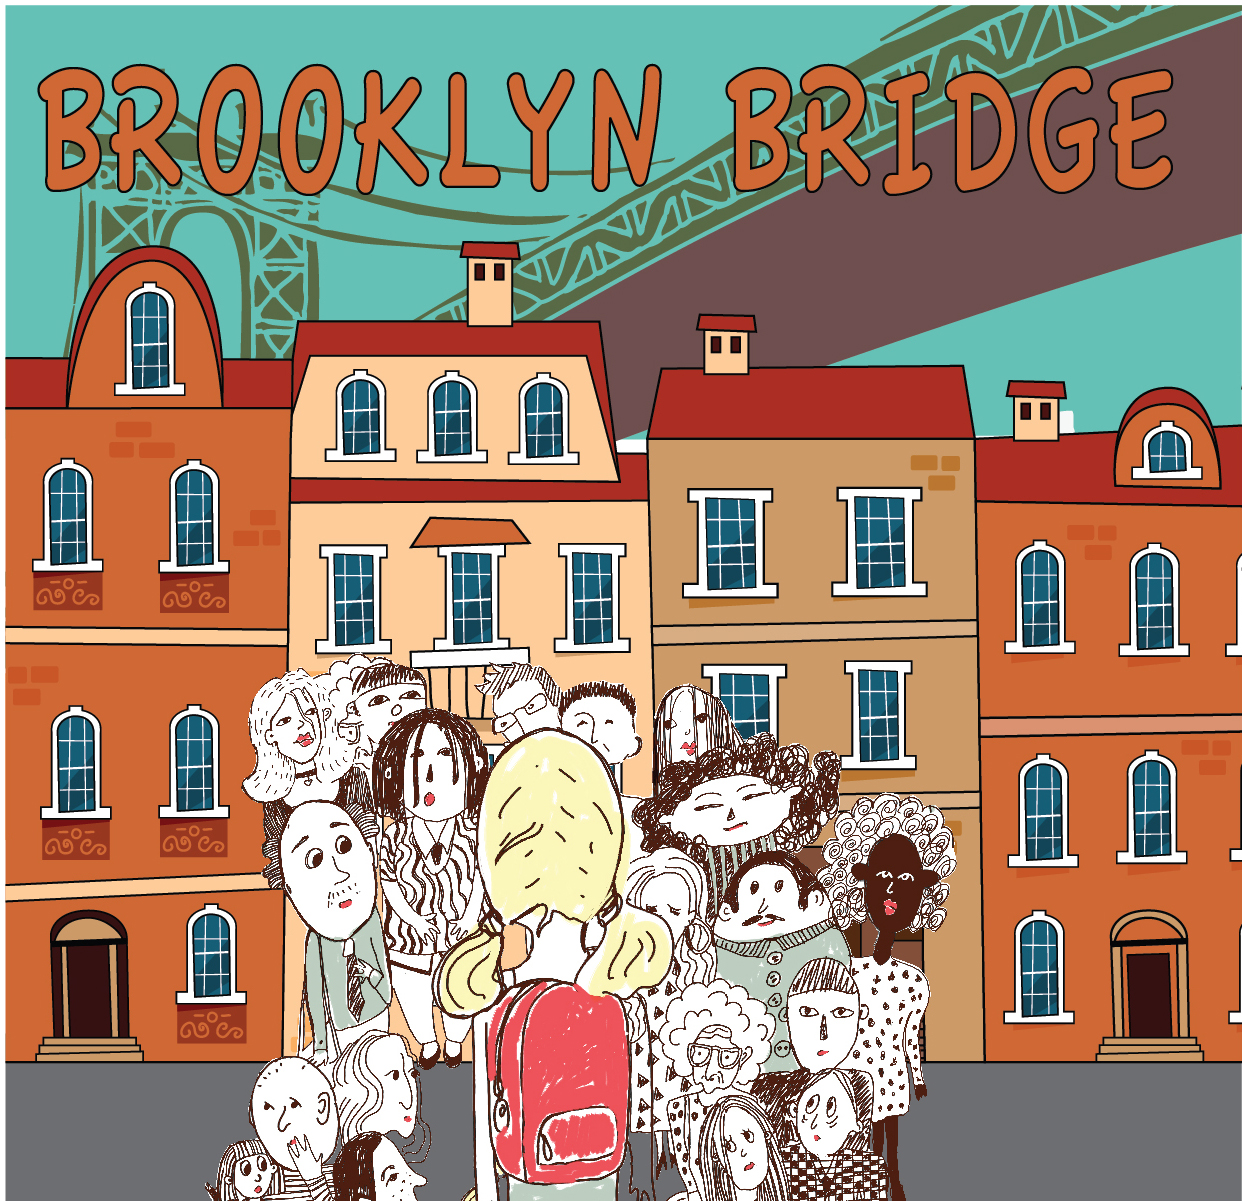 BrooklynBridgeLogo.jpg